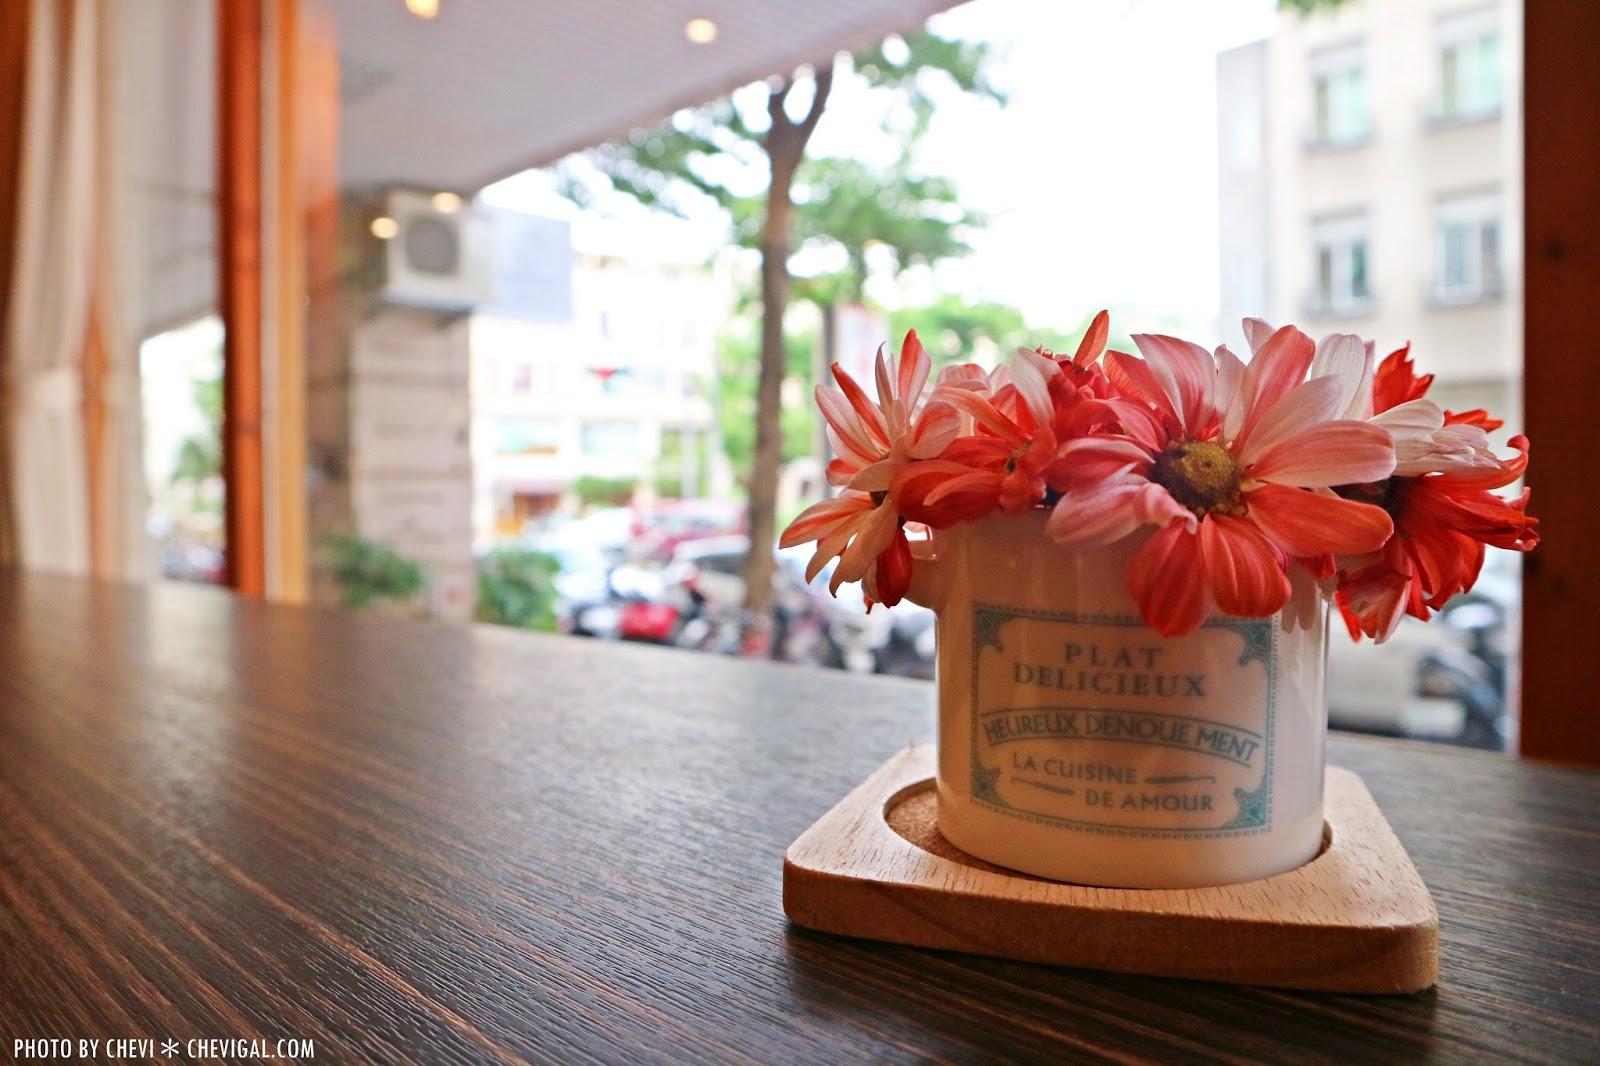 IMG 9564 - 台中烏日│FiMi 小後山廚房。新鮮手作法式甜點。森林清新風格好放鬆